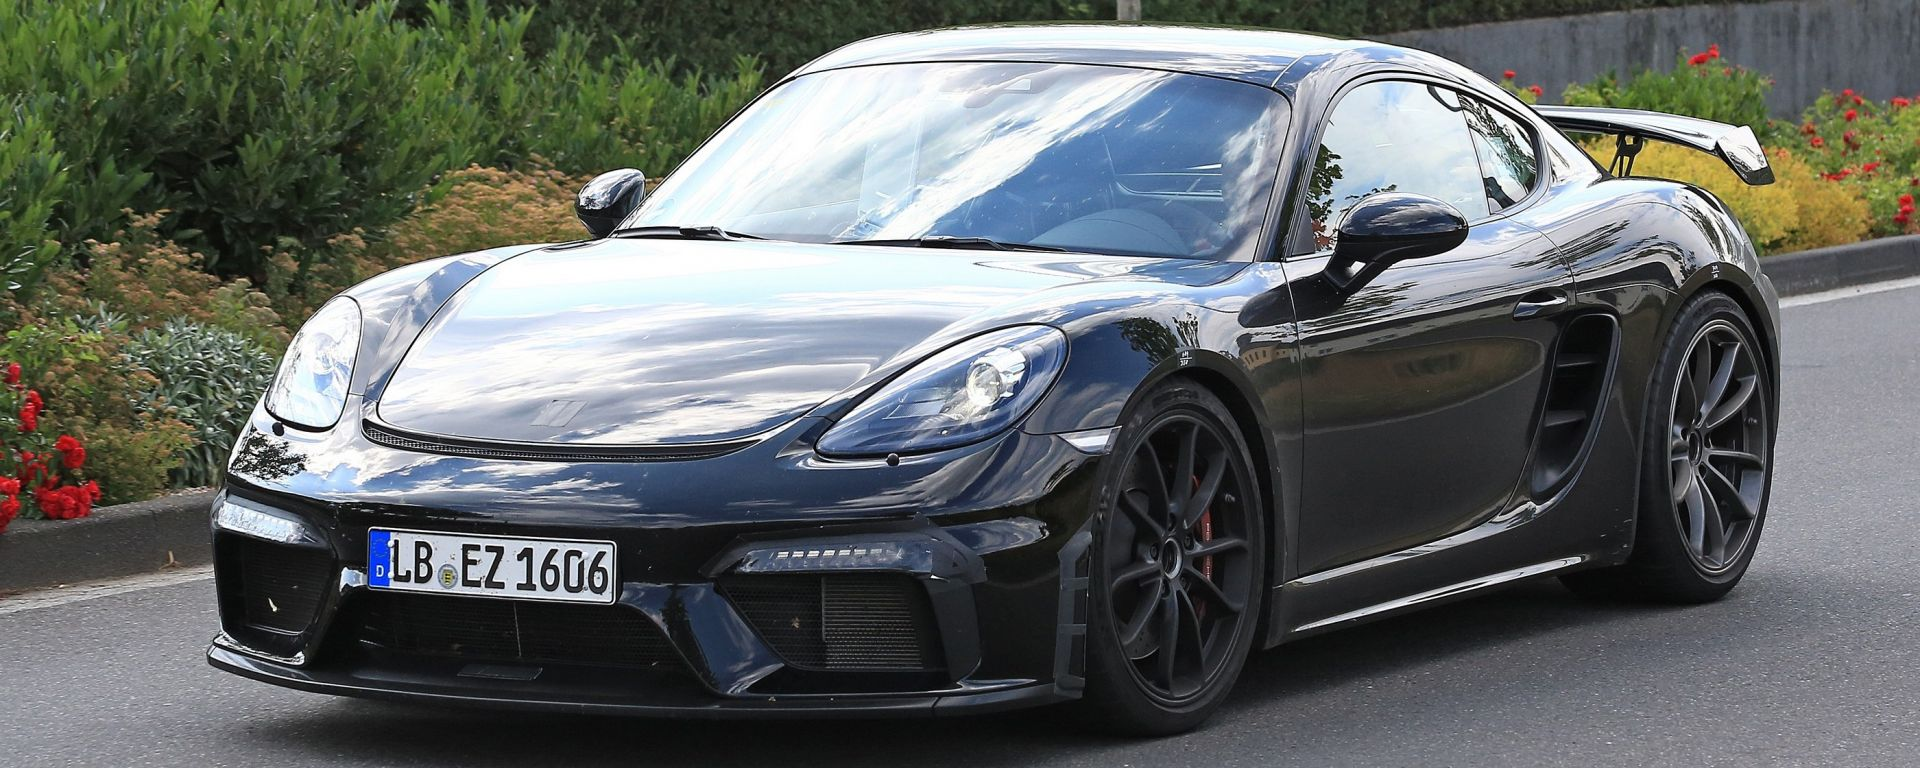 Porsche Cayman GT4: rumors e prime foto spia del facelift